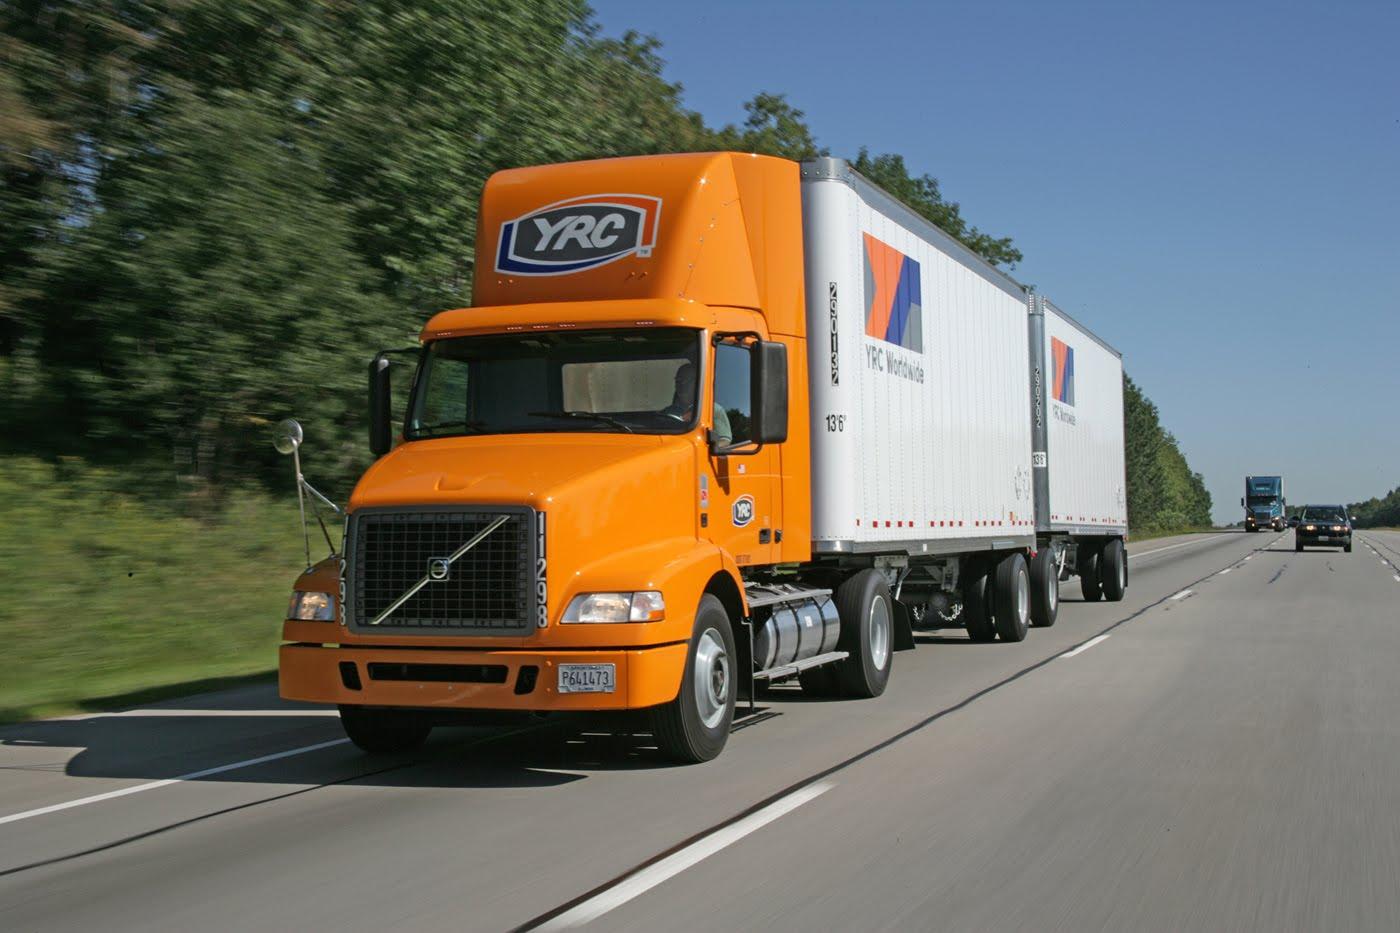 Yrc trucking cutting 221 jobs in ohio